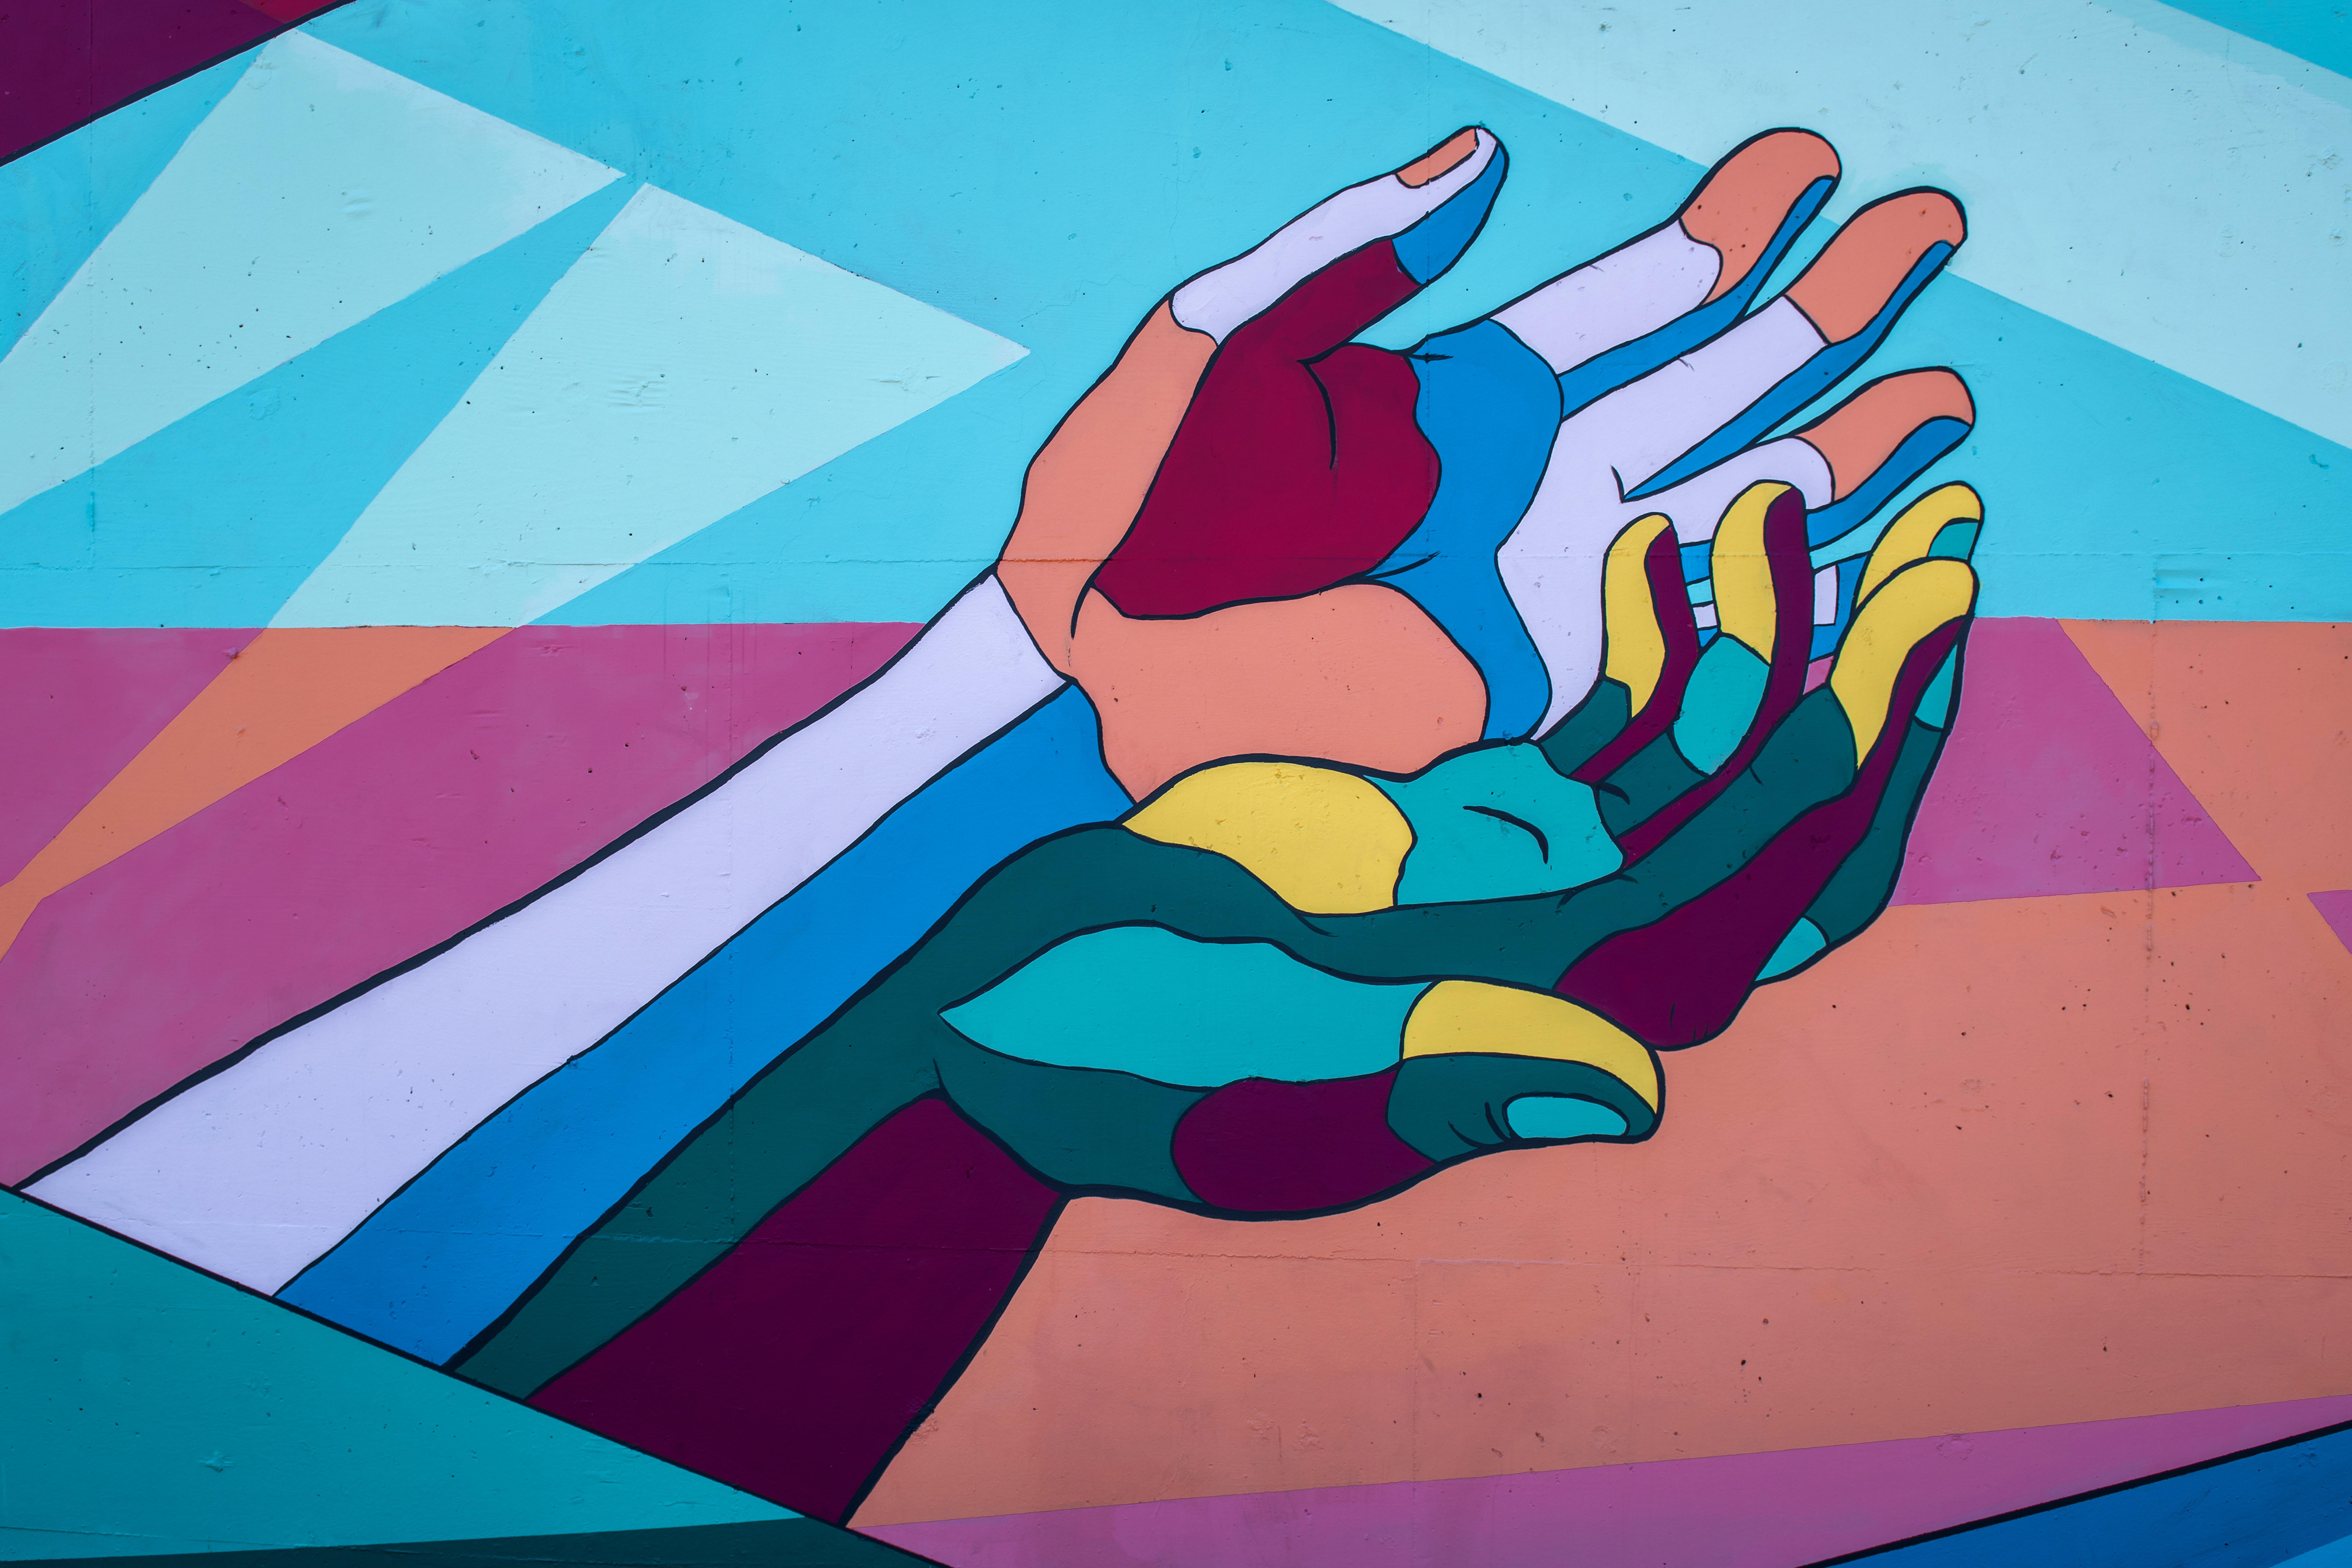 Photo of open colorful hands. Photo courtesy of Tim Mossholder on Unsplash.